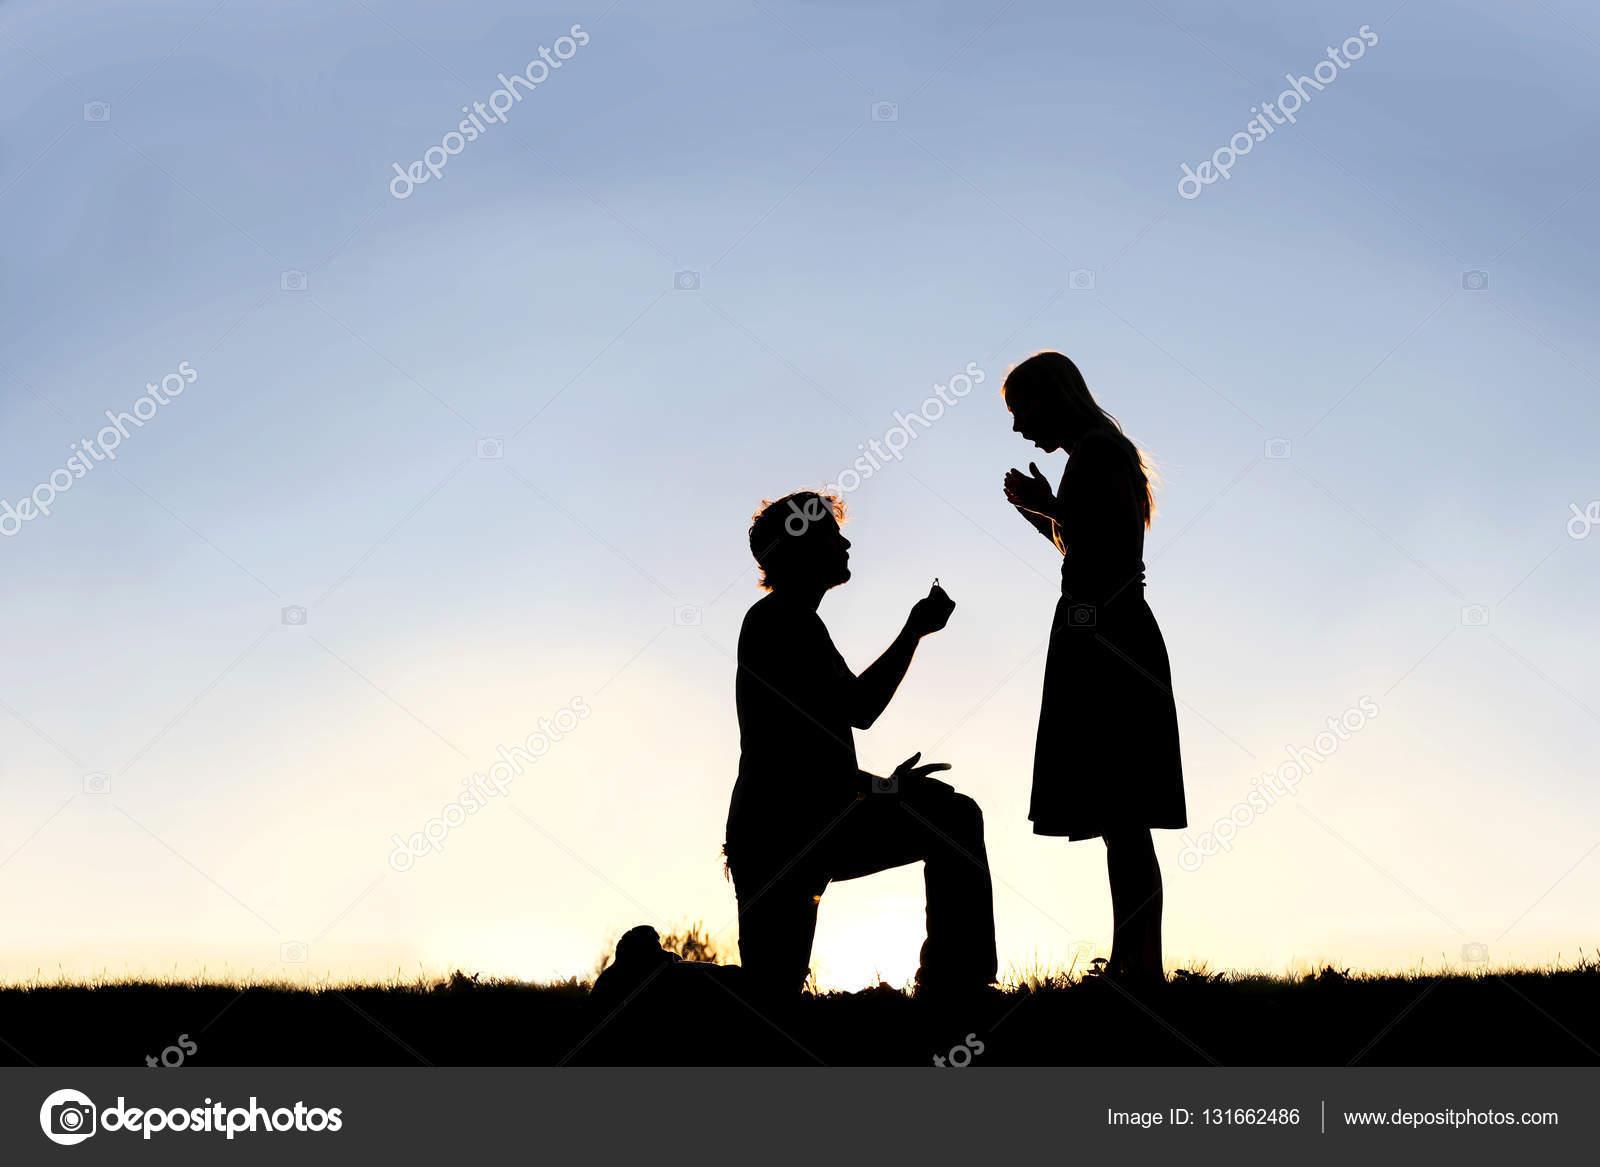 Silueta Hombre Y Mujer: Silueta De Hombre Joven Con Anillo De Compromiso Propone A